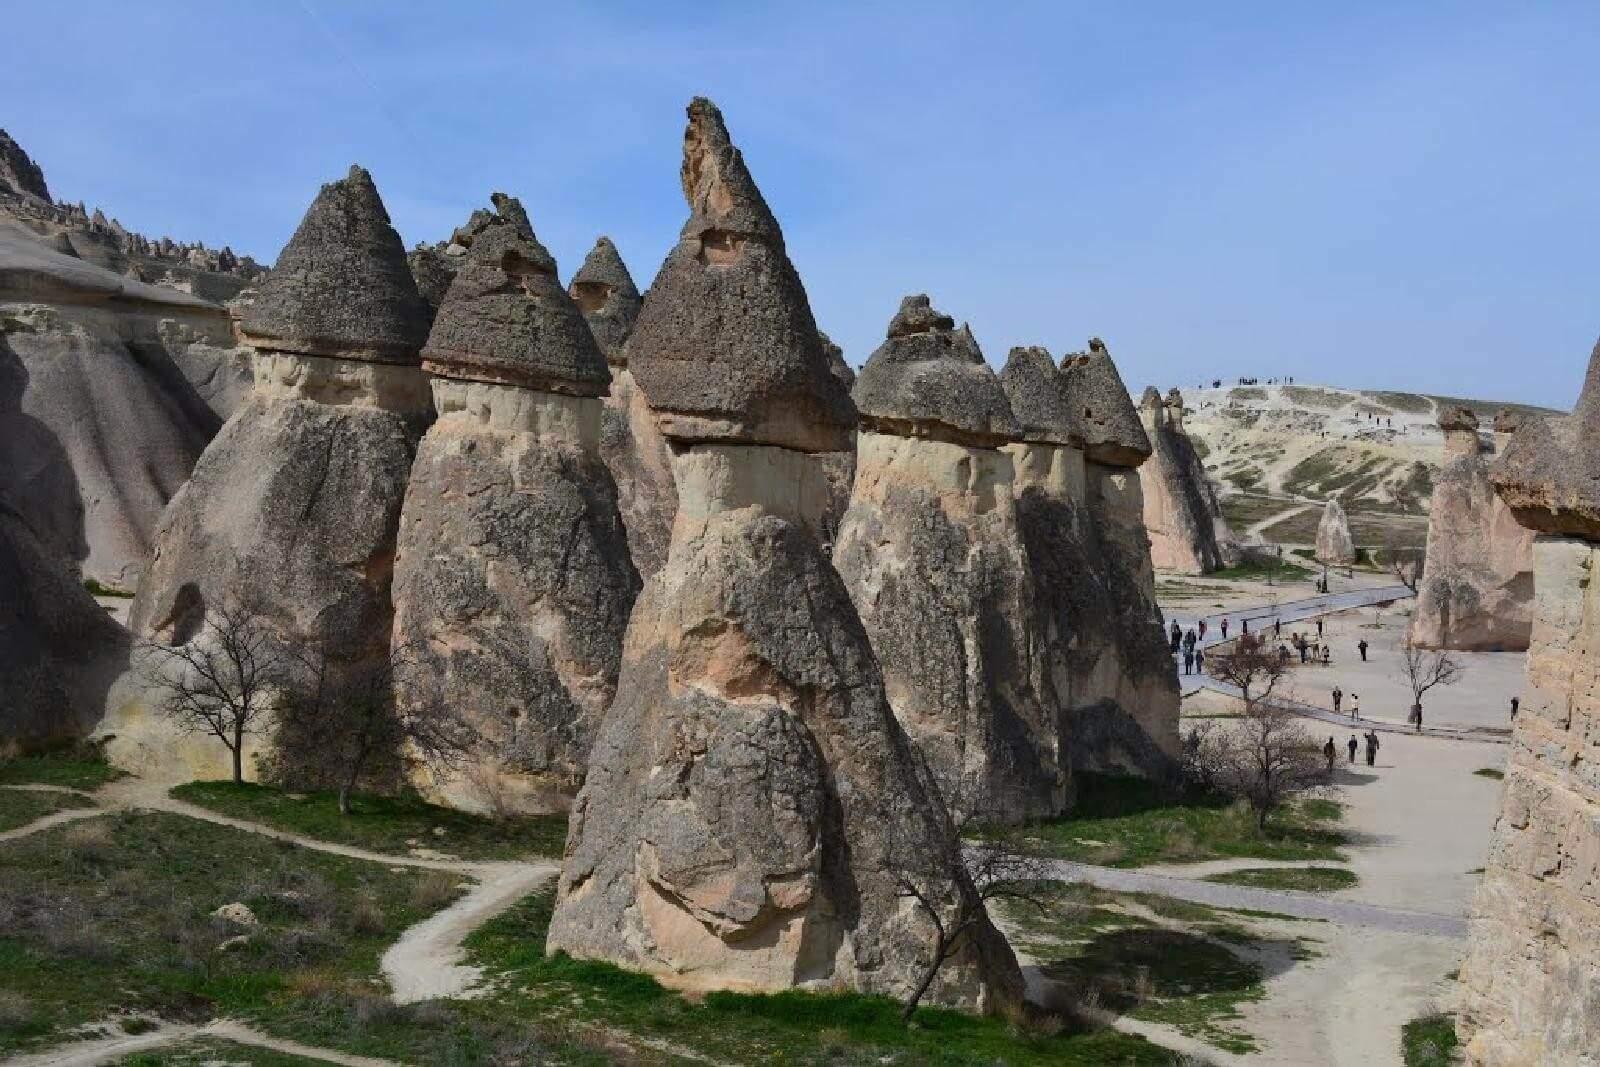 Fairy Chimneys in Paşabağı (Priests) Valley - Cappadocia